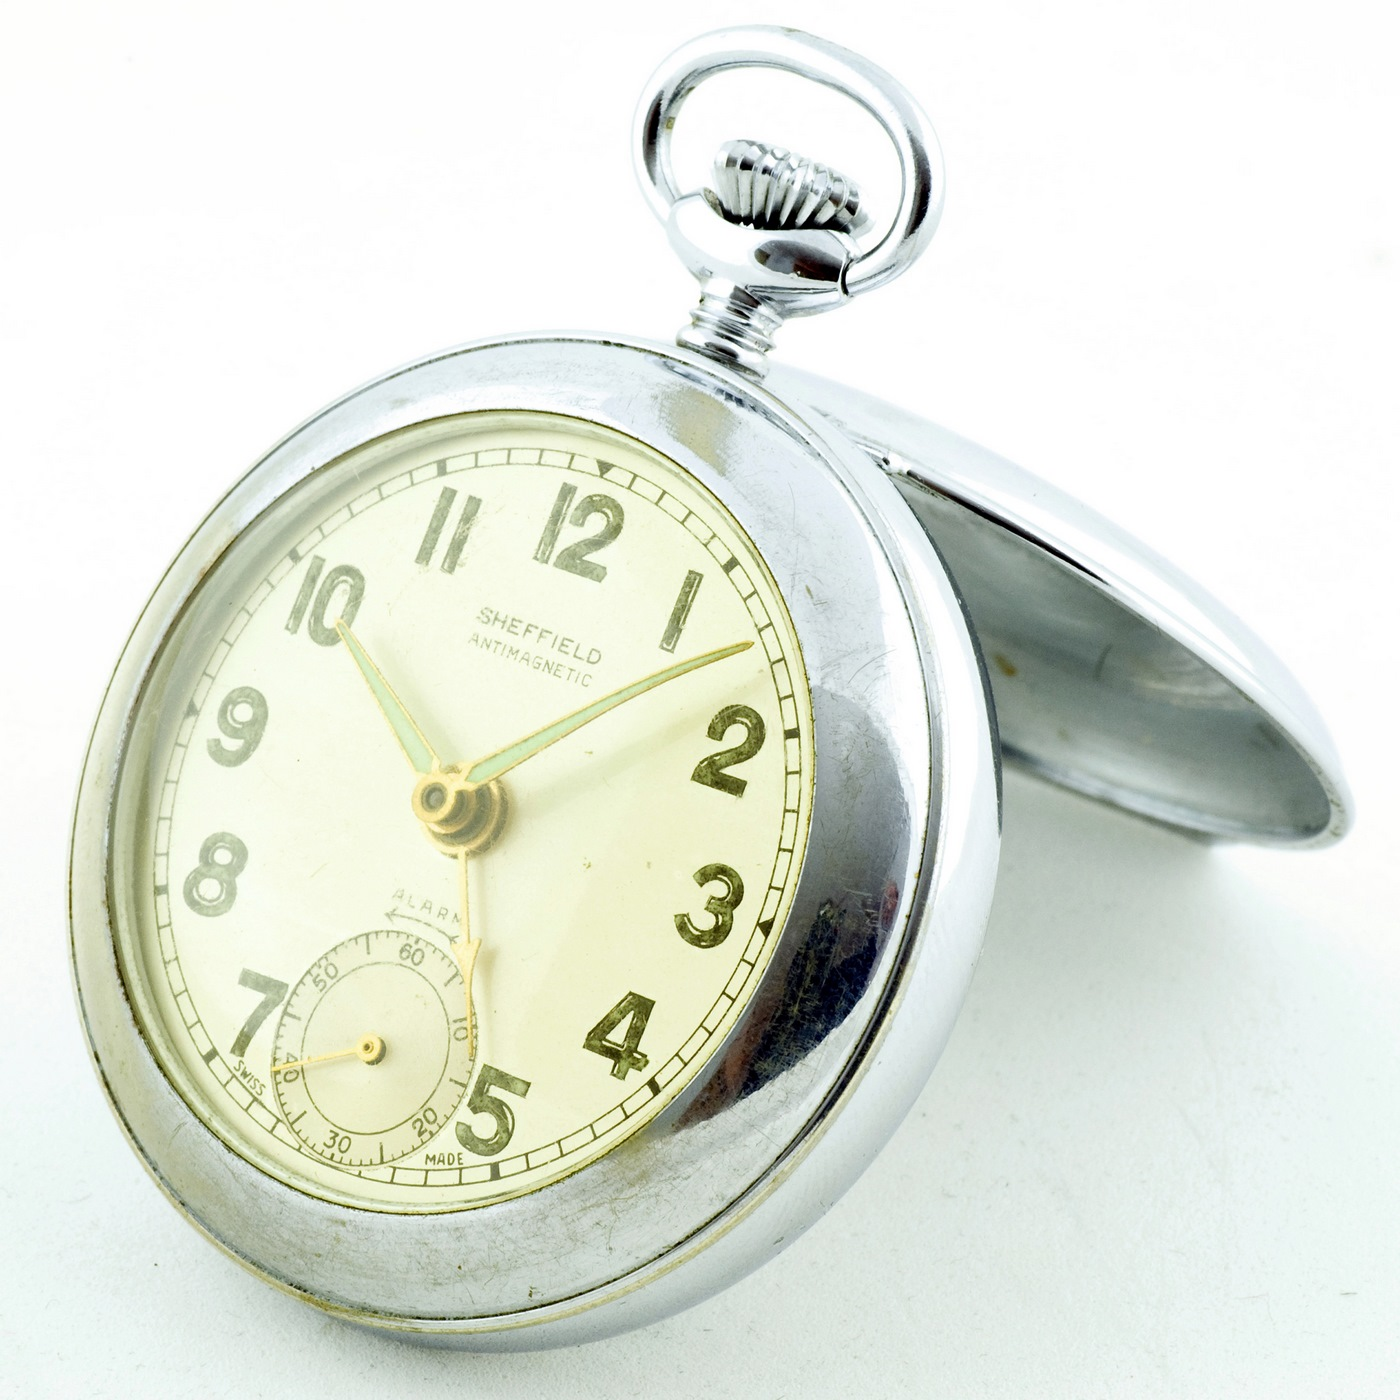 Reloj Suizo Despertador de bolsillo, sobremesa, lepine y remontoir. Sheffield, ca. 1940.